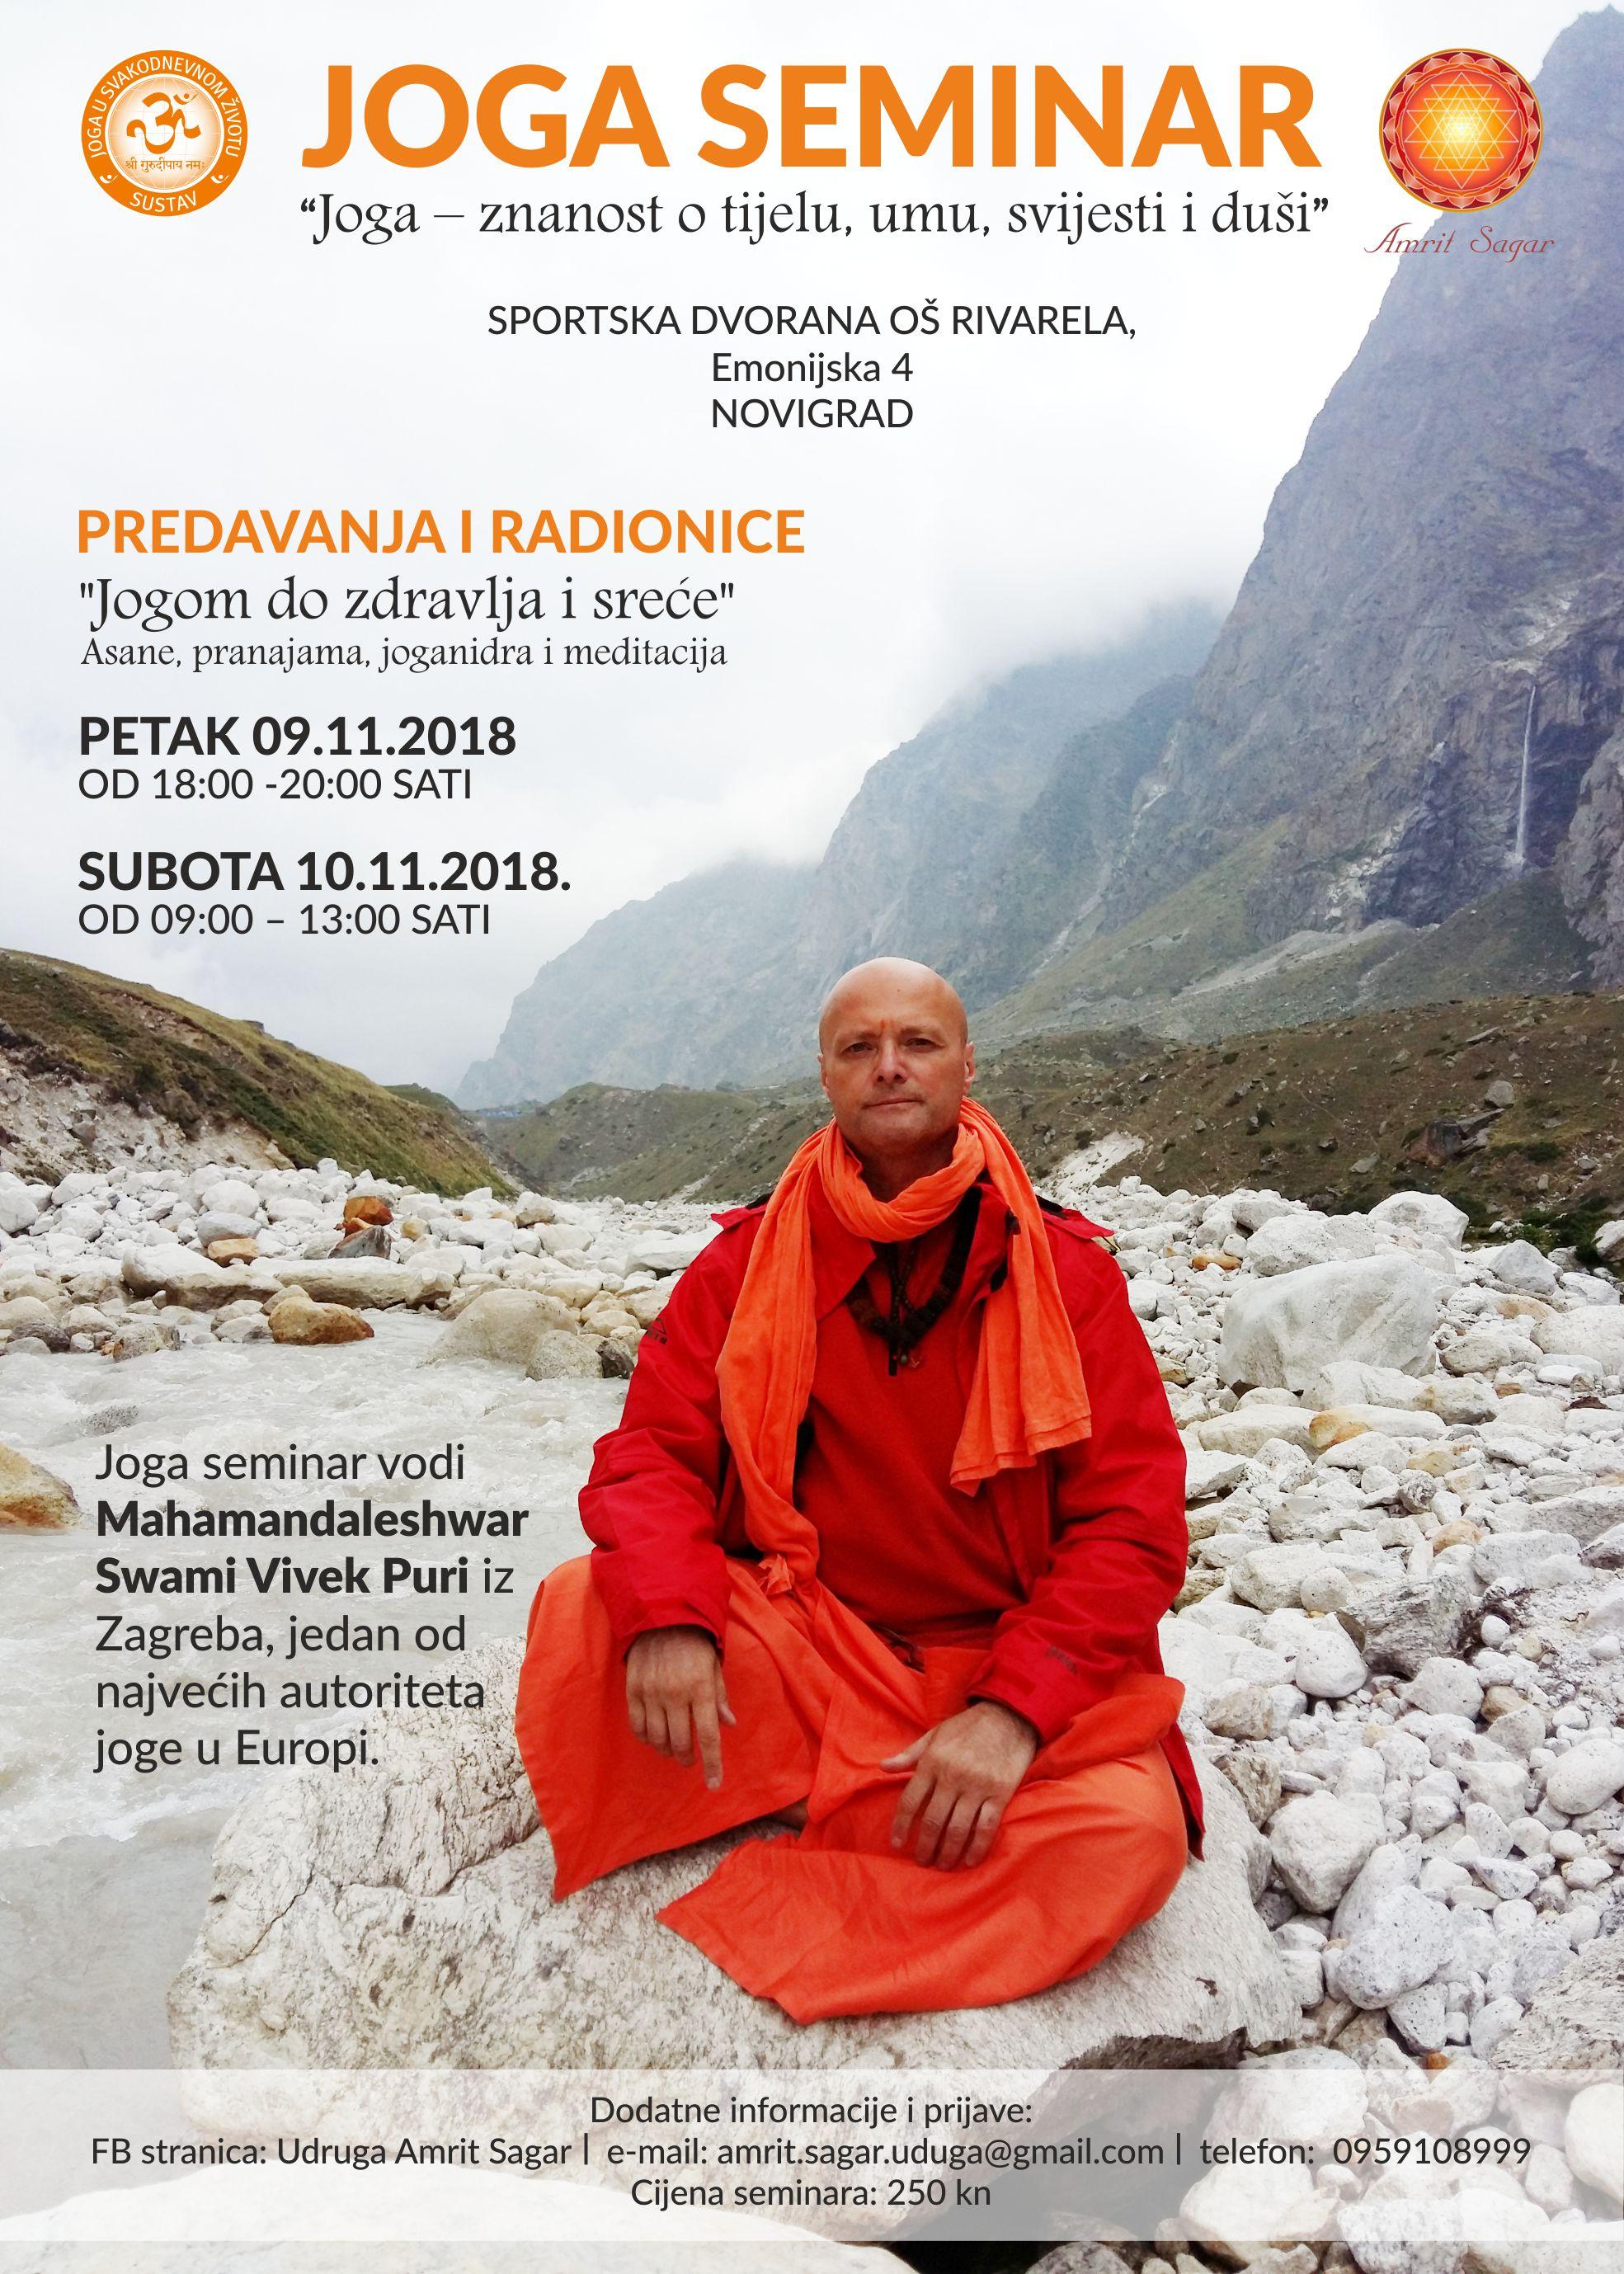 http://www.novigrad.hr/joga_seminar_predavanja_i_radionice_jogom_do_zdravlja_i_sree